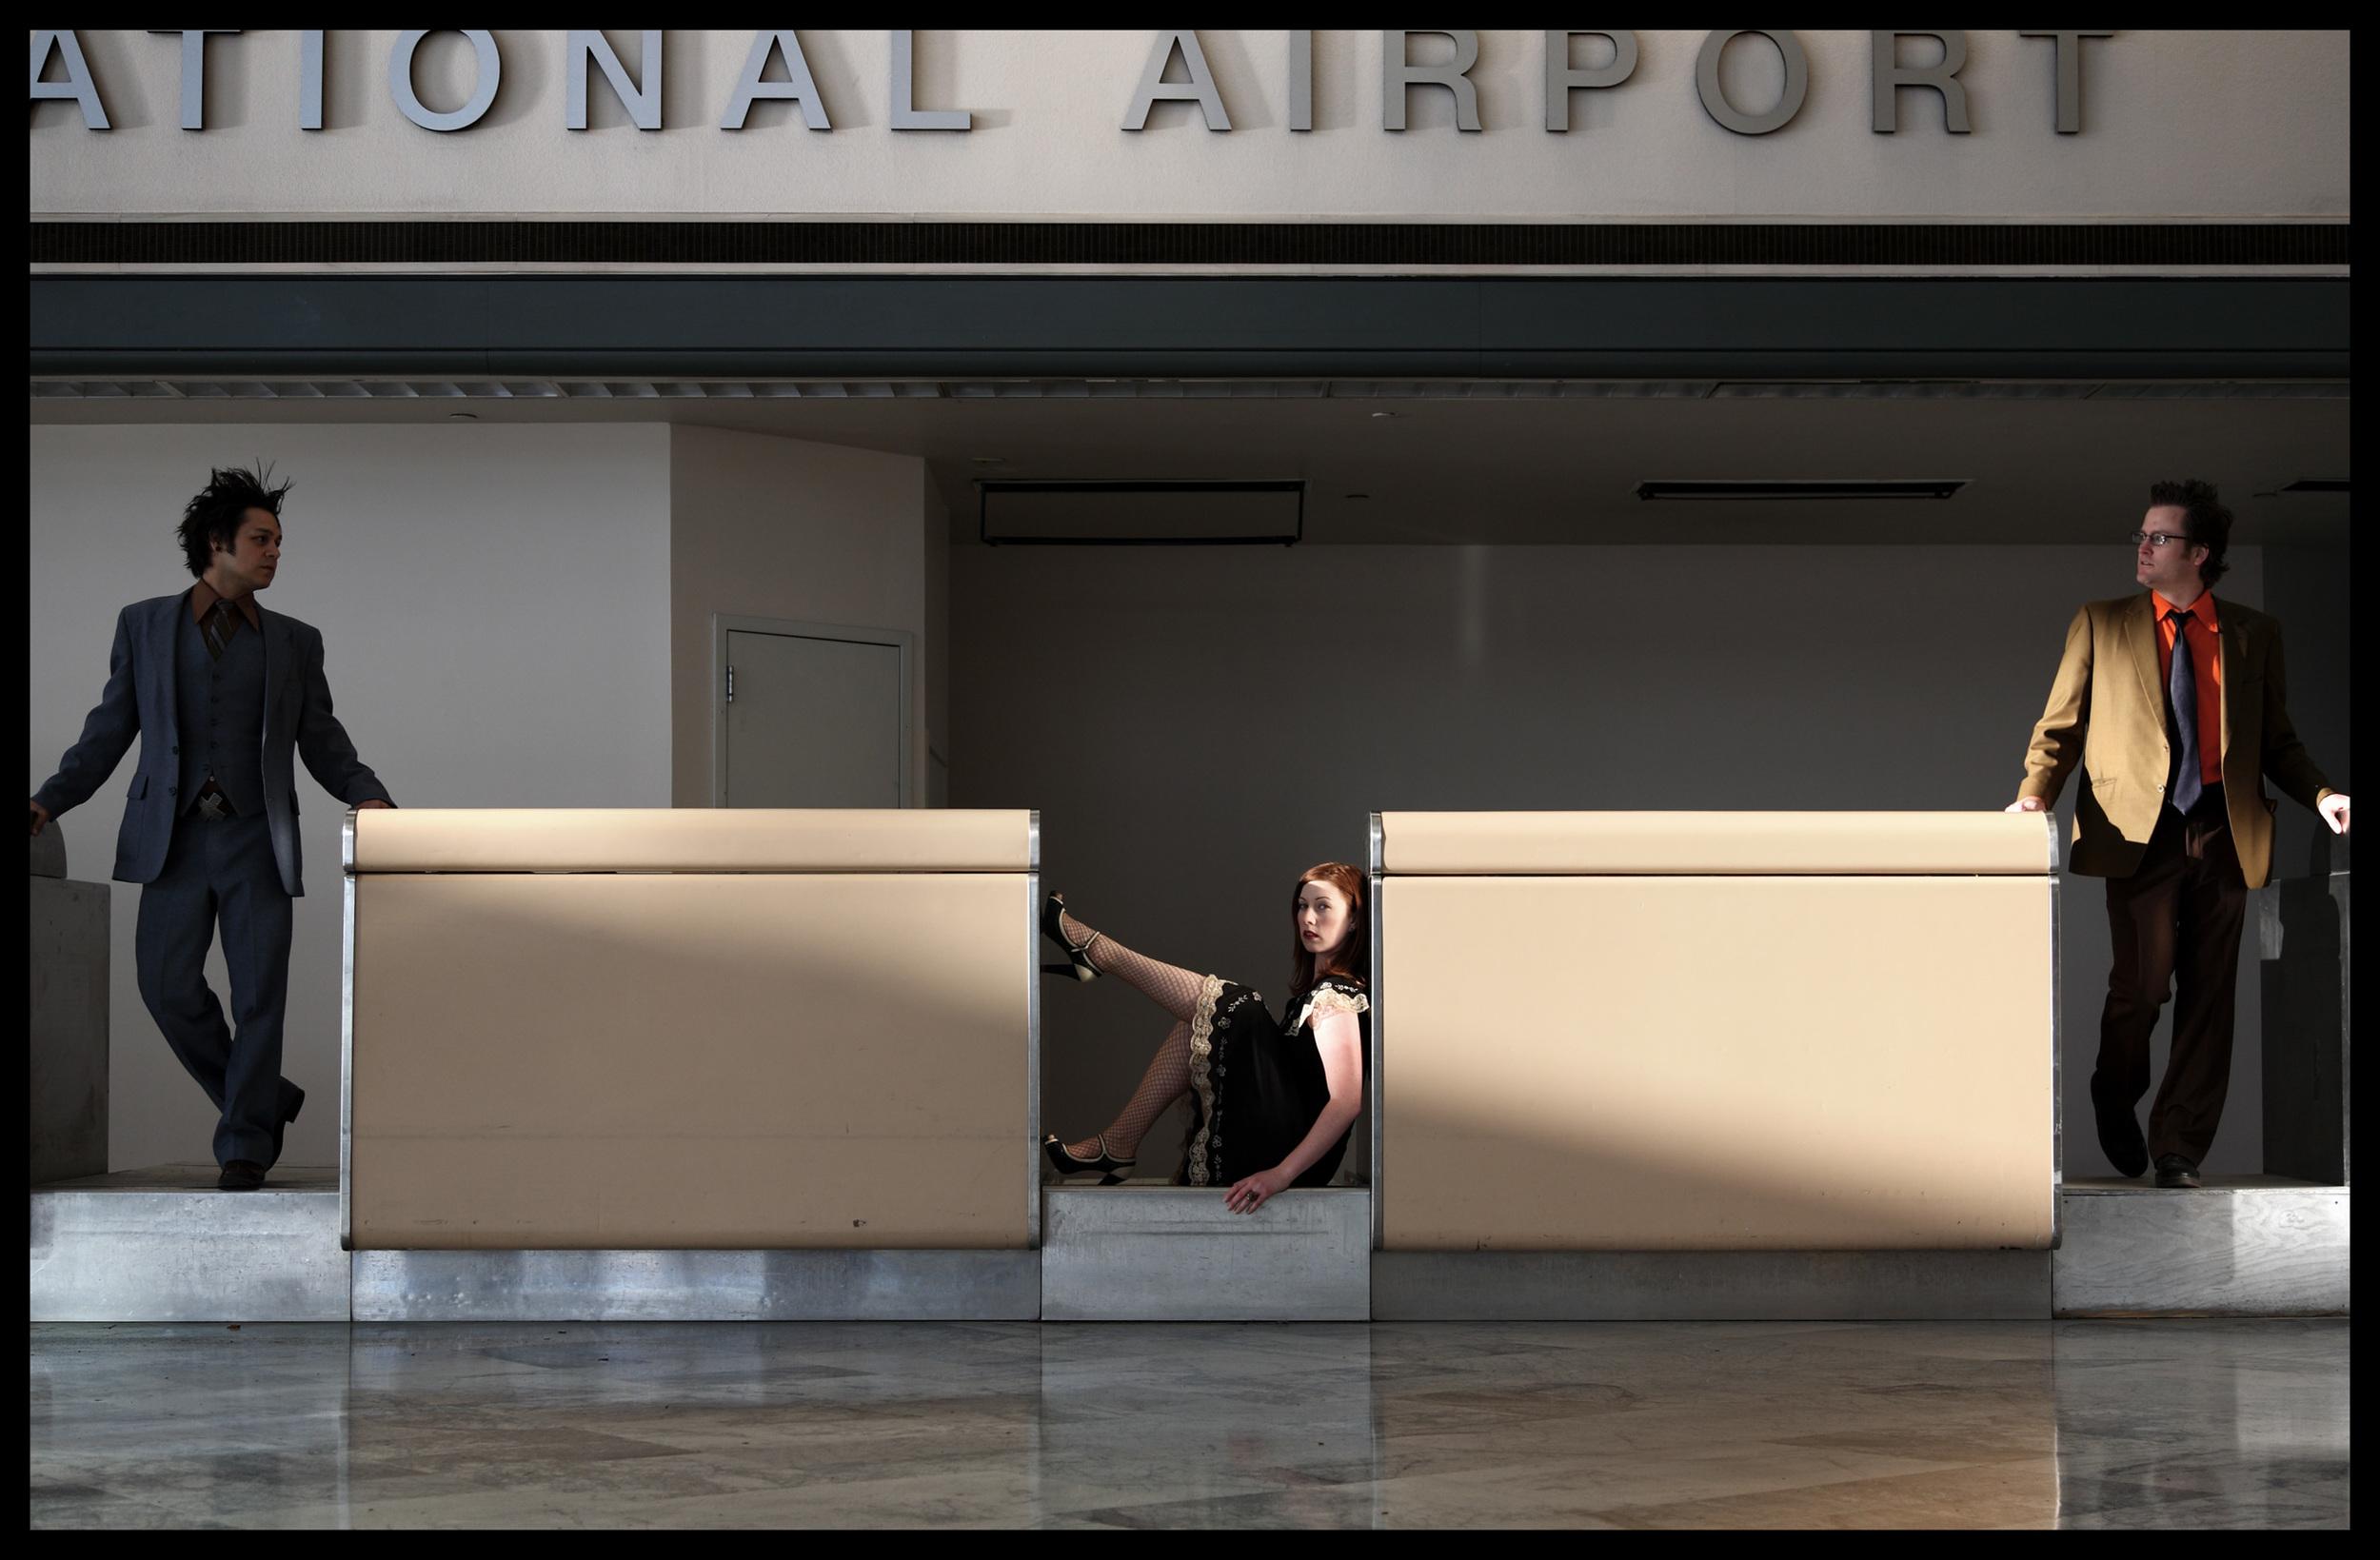 ational-airport_2435089059_o.jpg